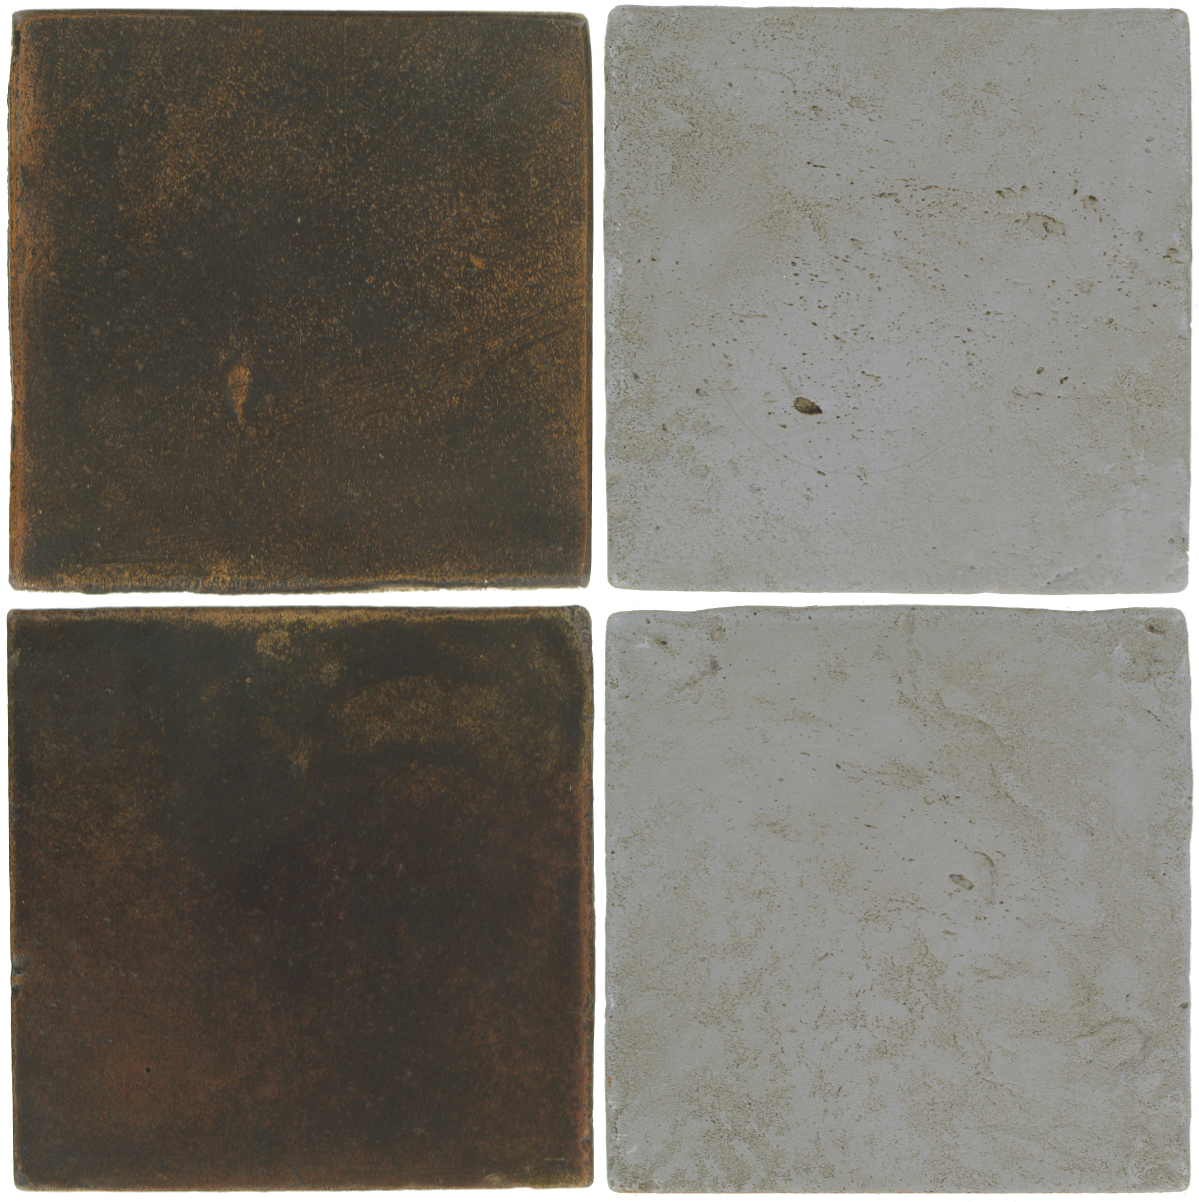 Pedralbes Antique Terracotta  2 Color Combinations  OHS-PSCO Cologne Brown + VTG-PGOG Oyster Grey